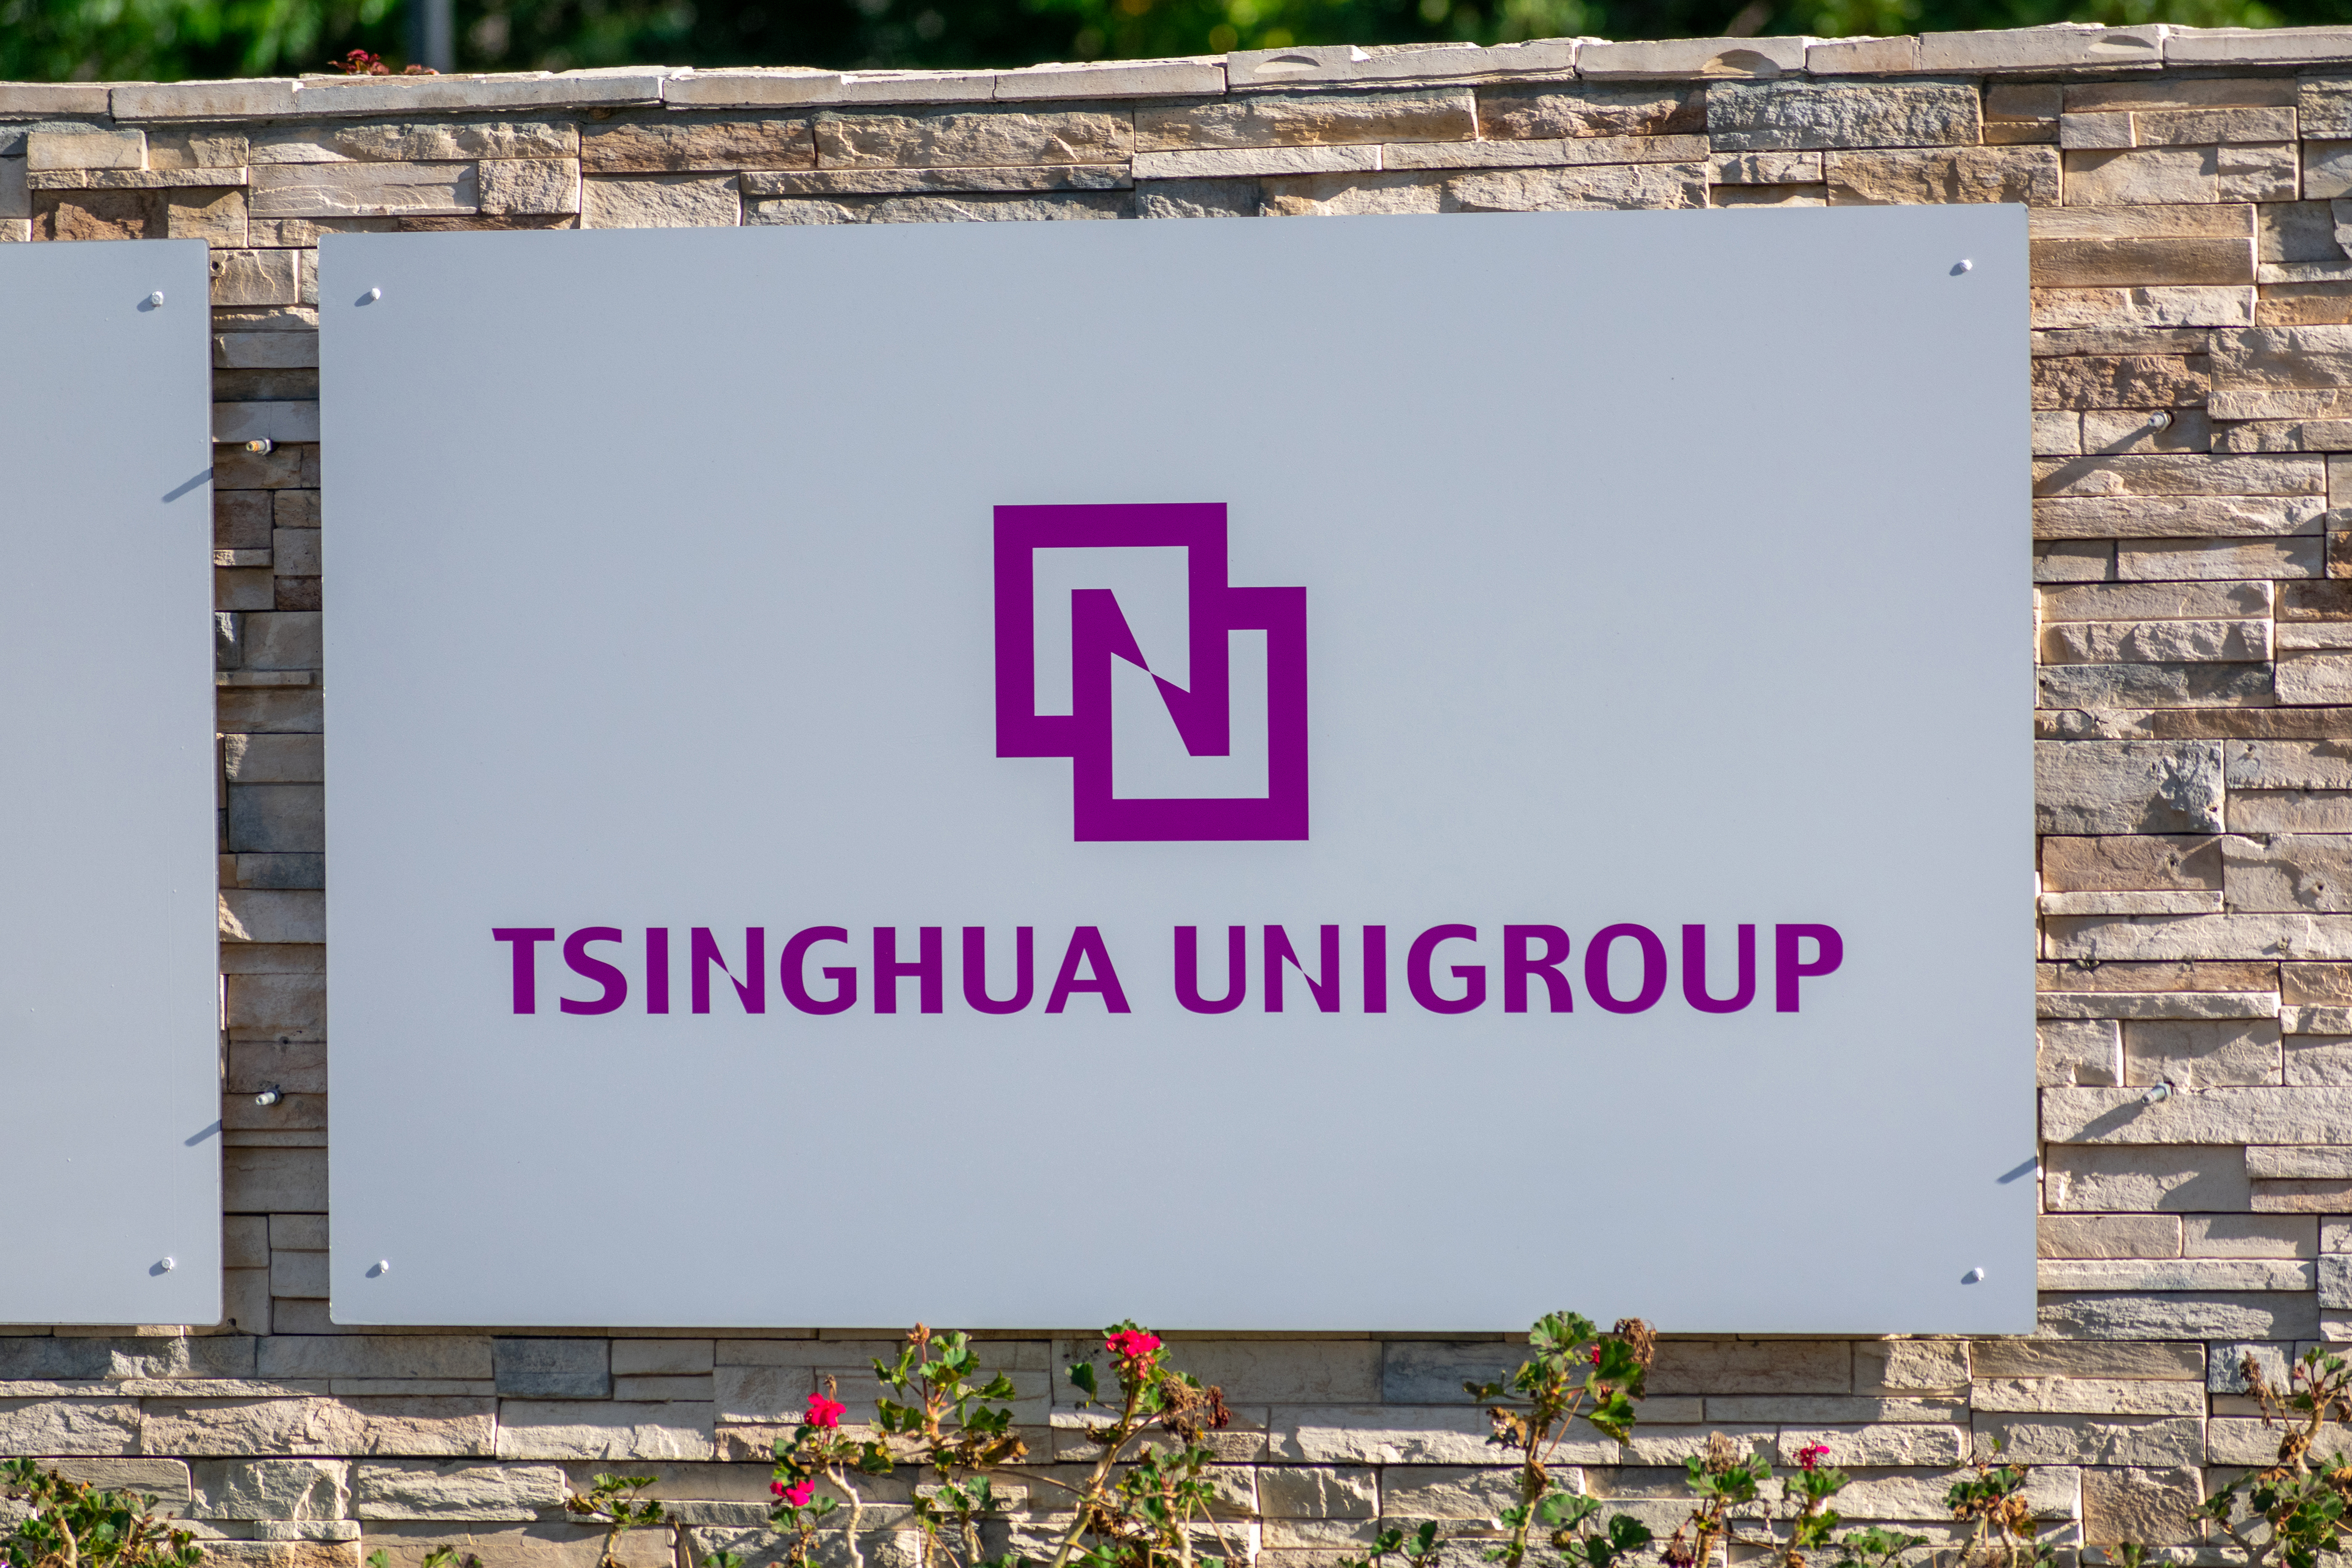 Tsinghua Unigroup next chipmaker to default on bond